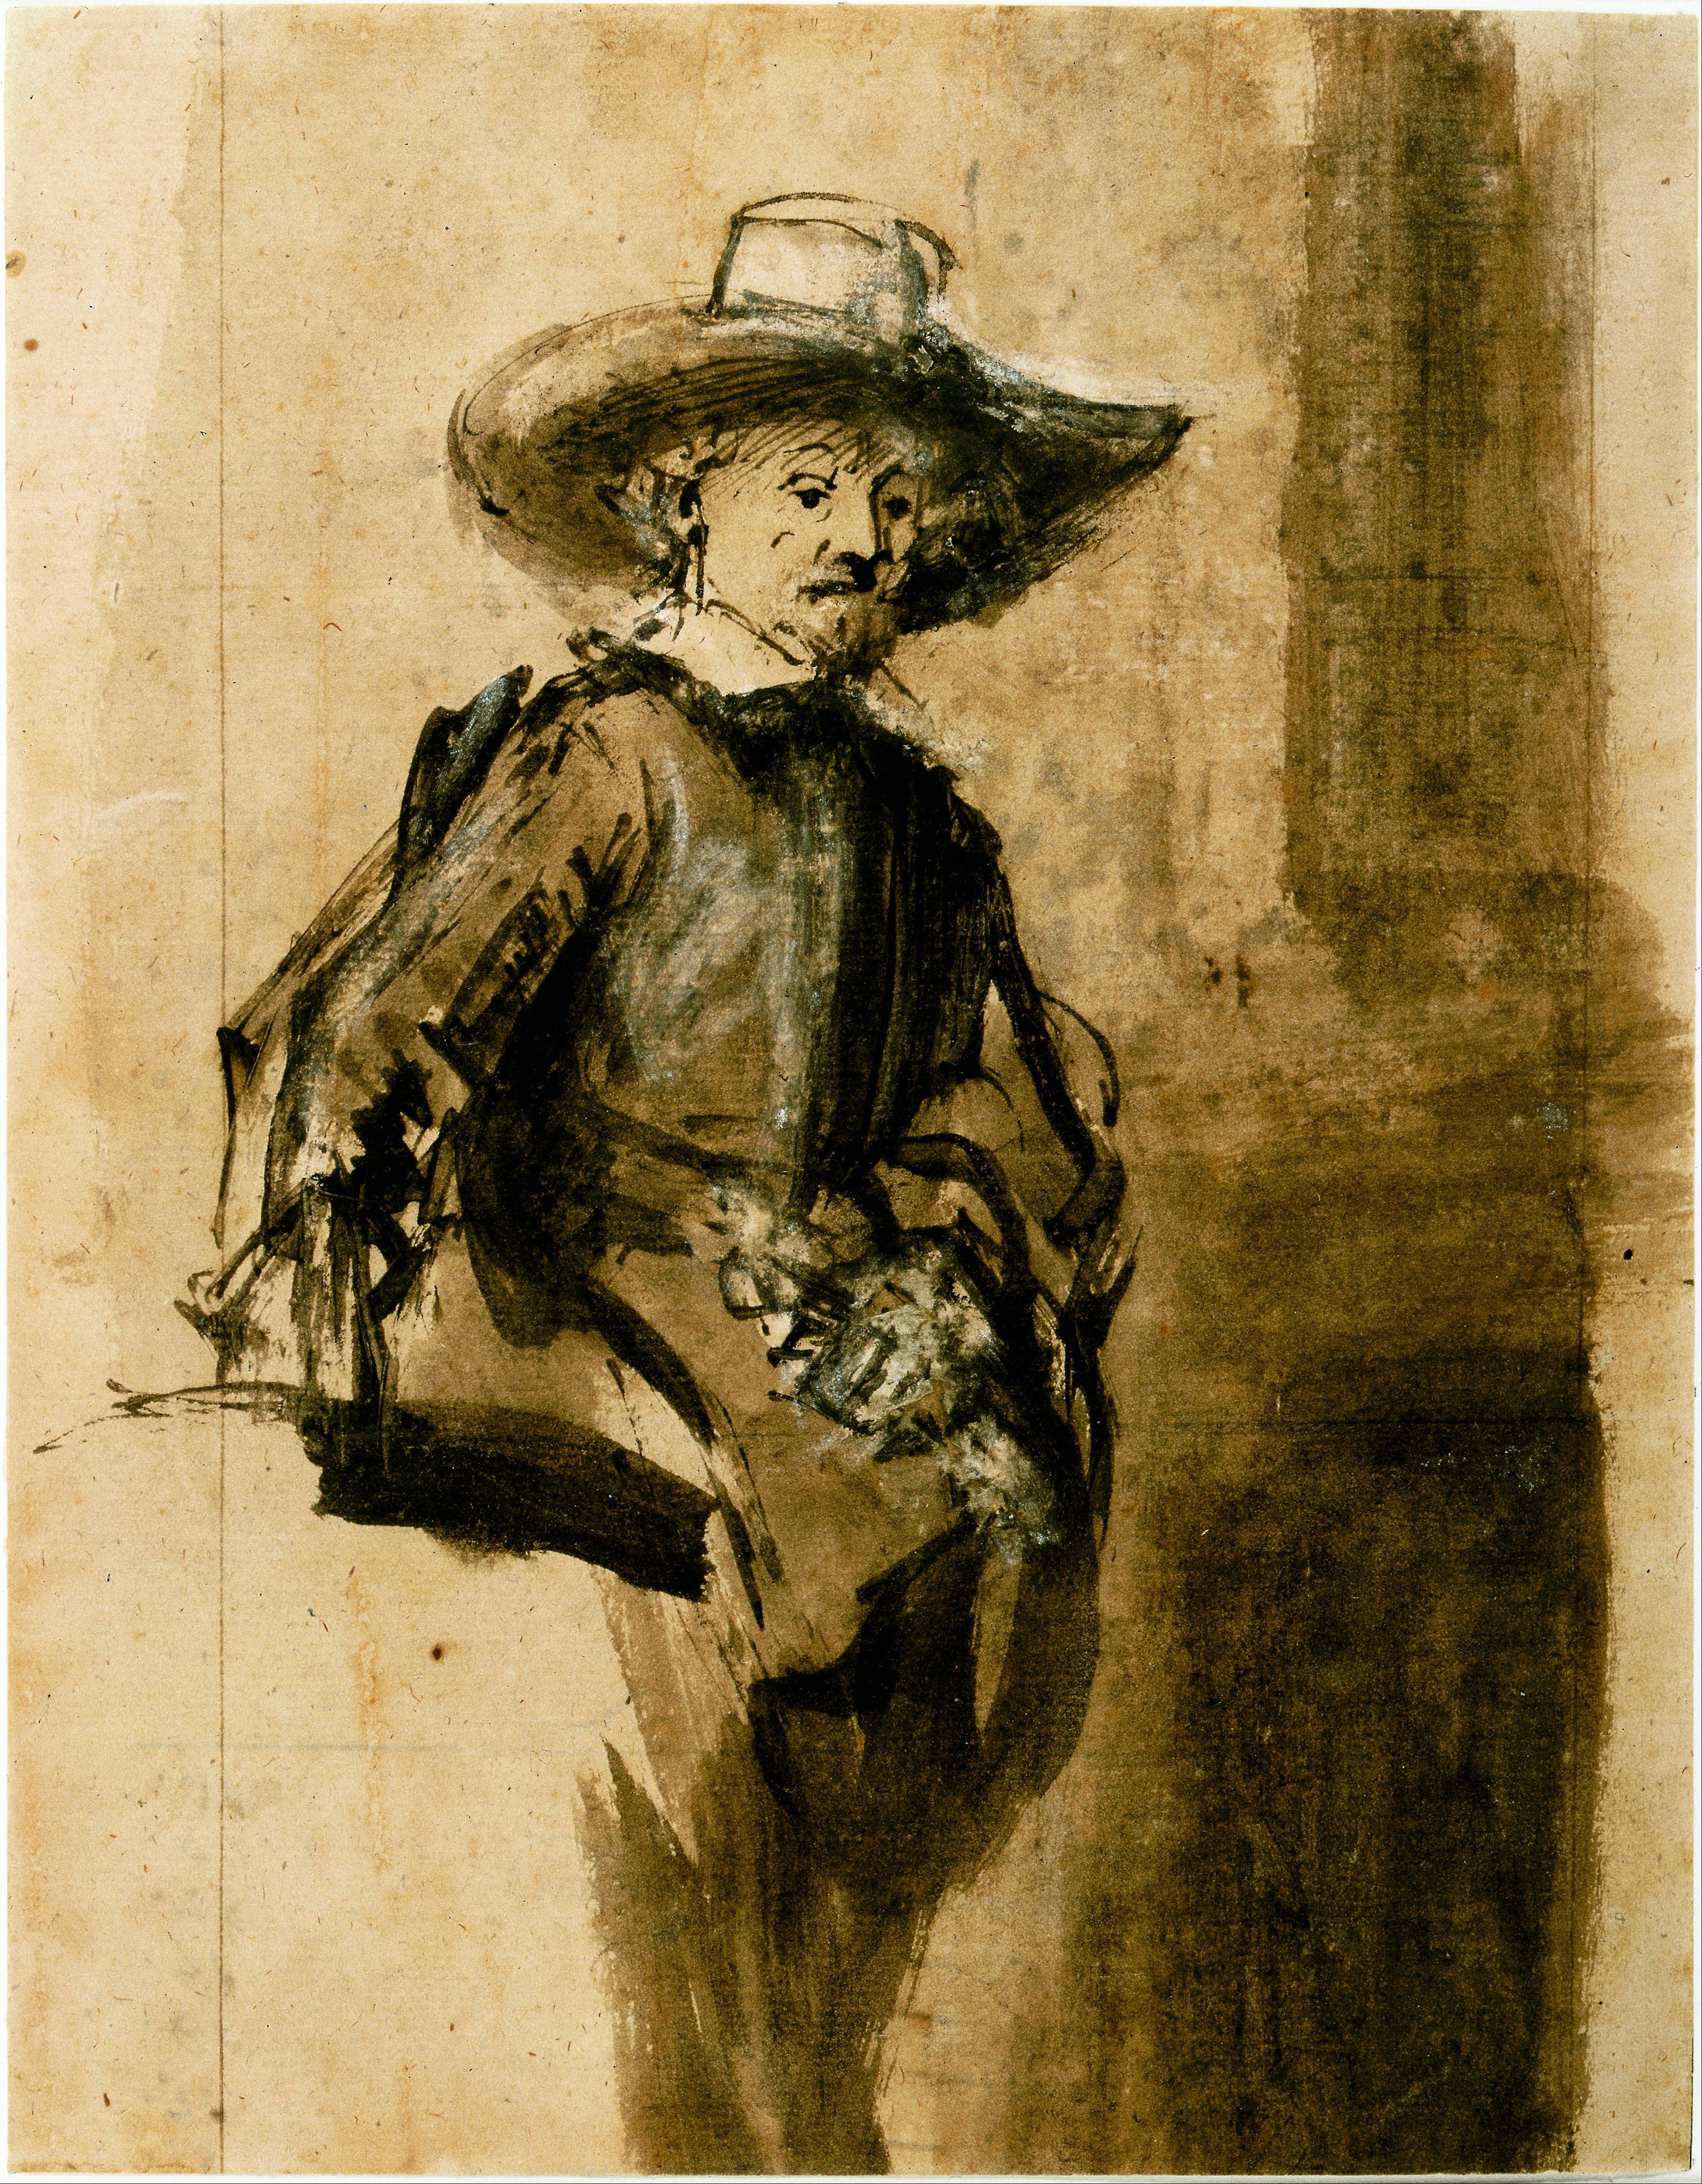 Rembrandt - Painter - Biography